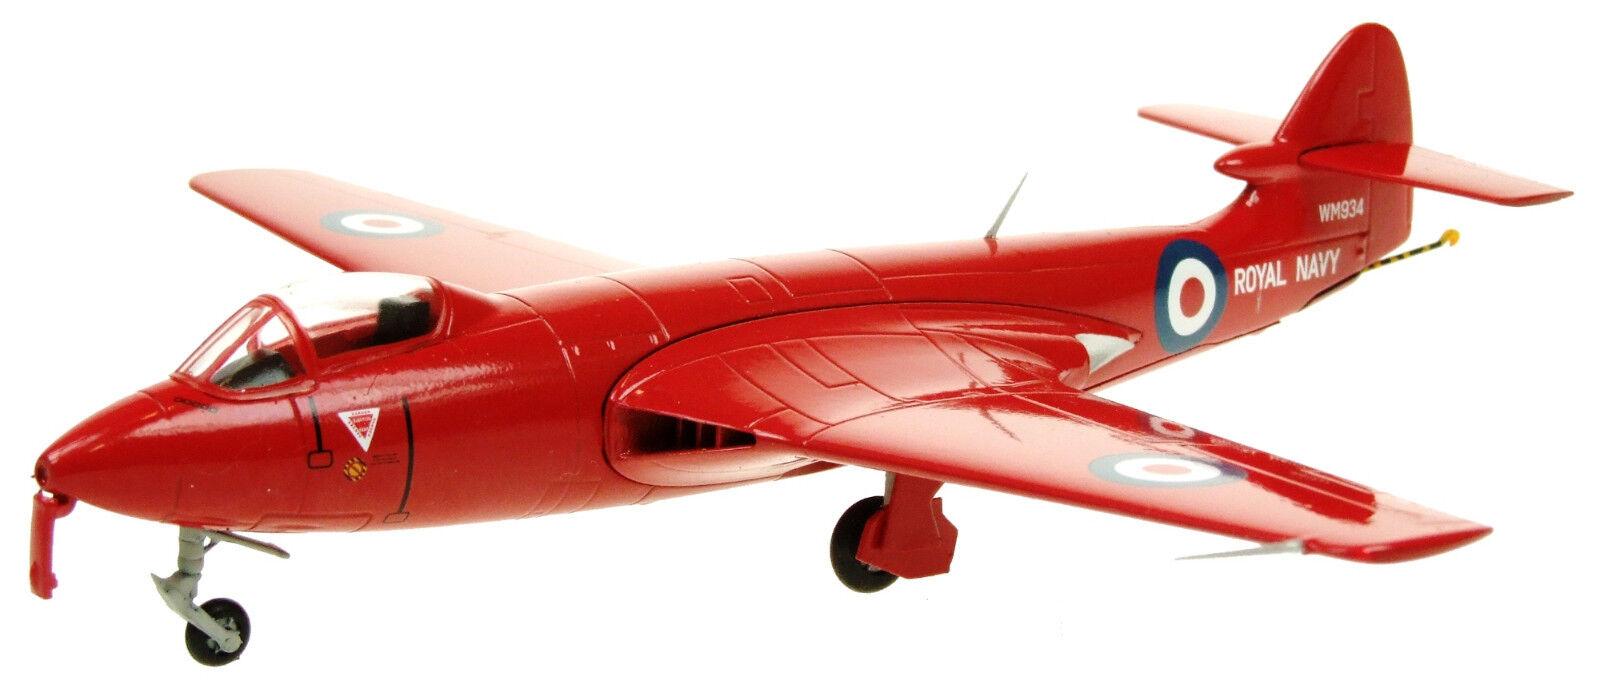 AVIATION72 AV7223007 1 72 HAWKER SEA HAWK HAWK HAWK RED DEVILS DISPLAY TEAM 1957 WM934 dd6f98